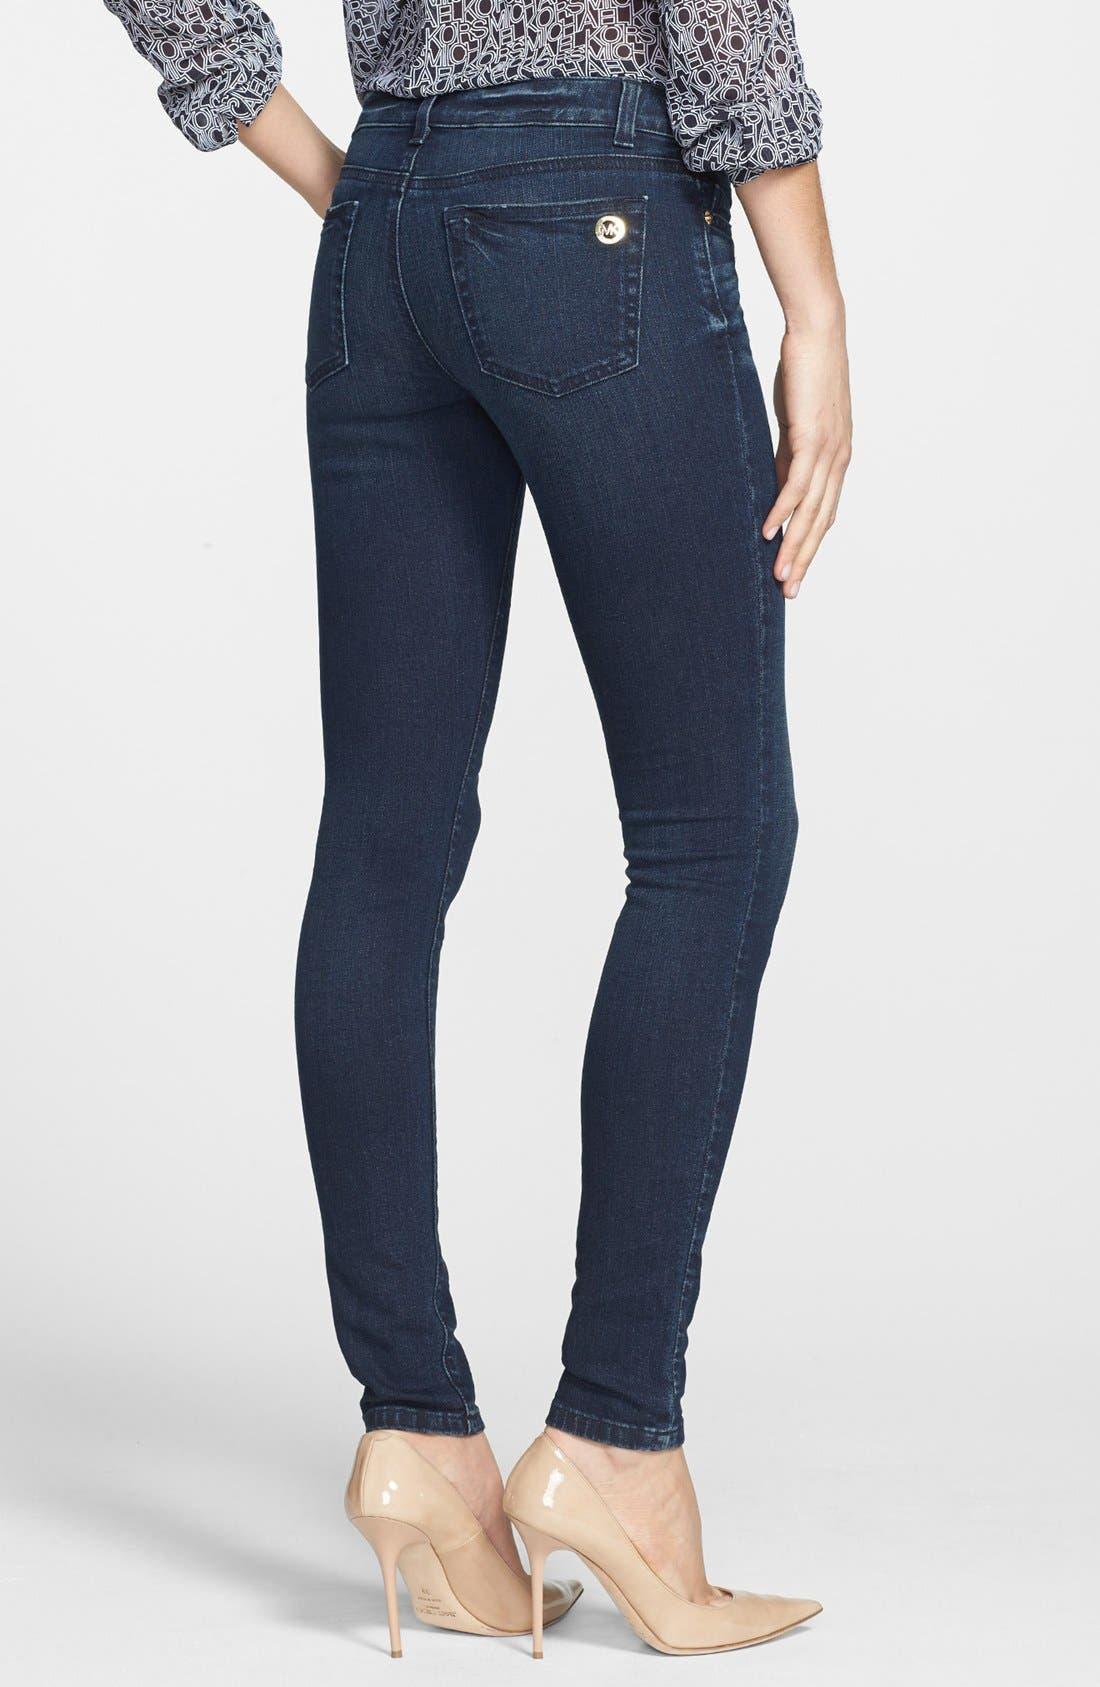 Alternate Image 2  - MICHAEL Michael Kors 'Jetset' Stretch Skinny Jeans (Stellar)